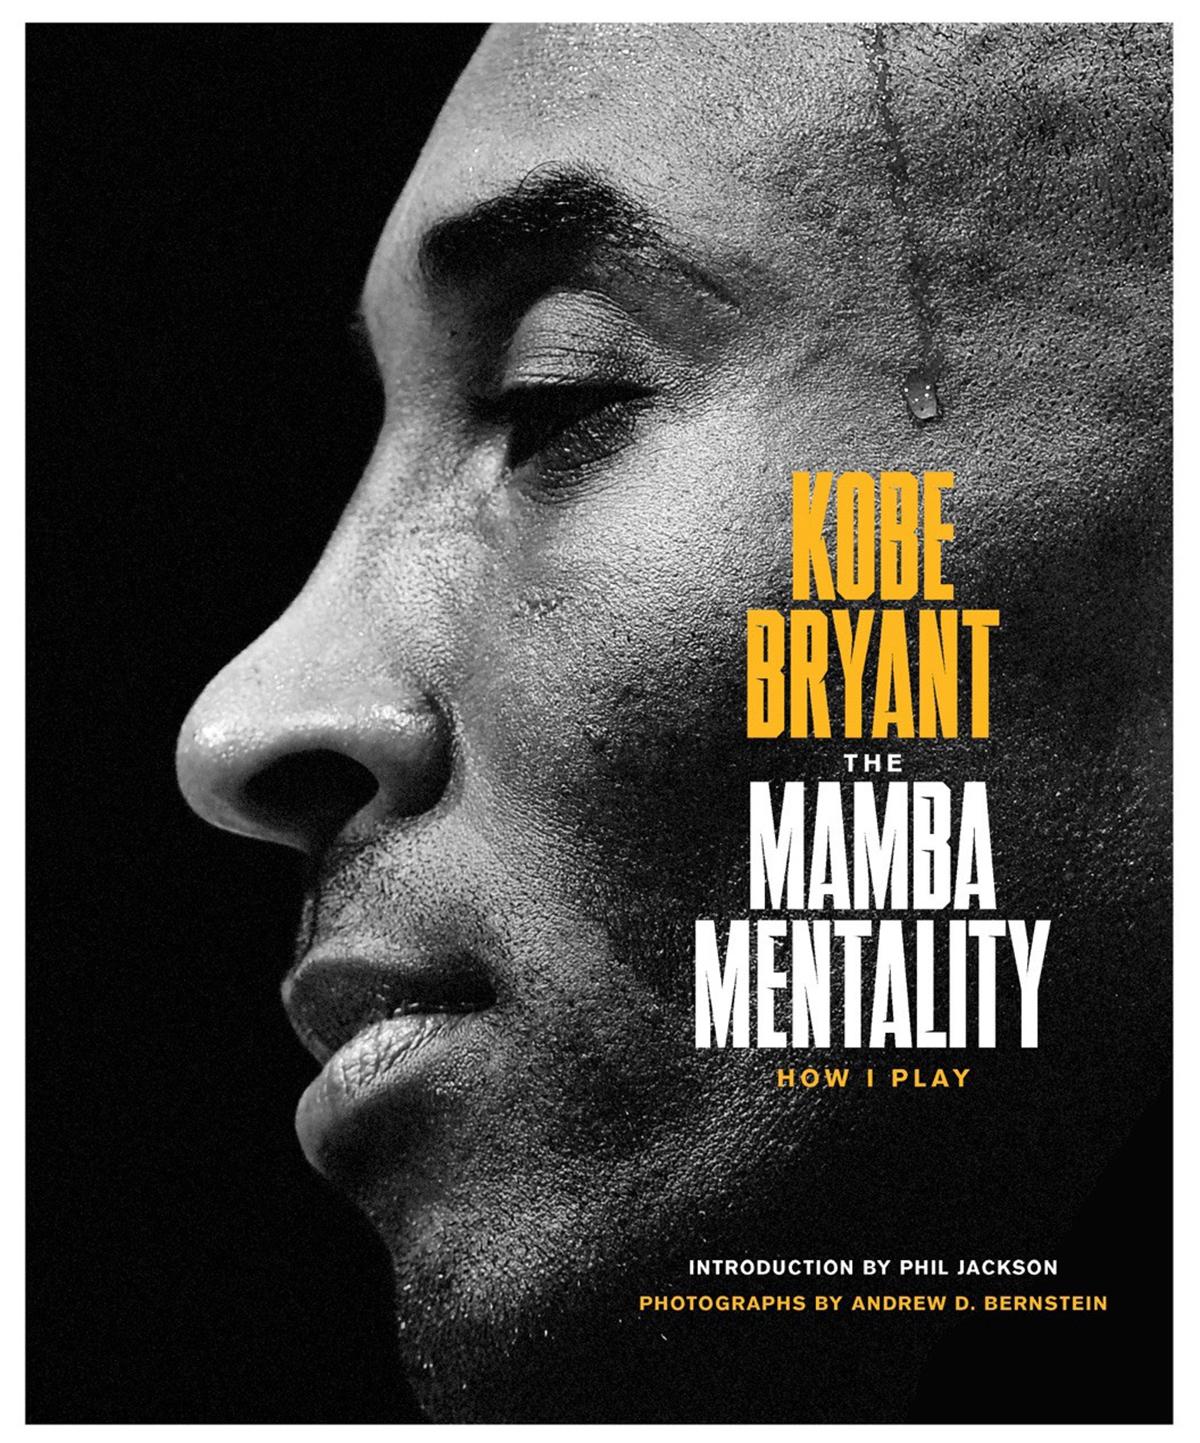 NCN Kobe Bryant